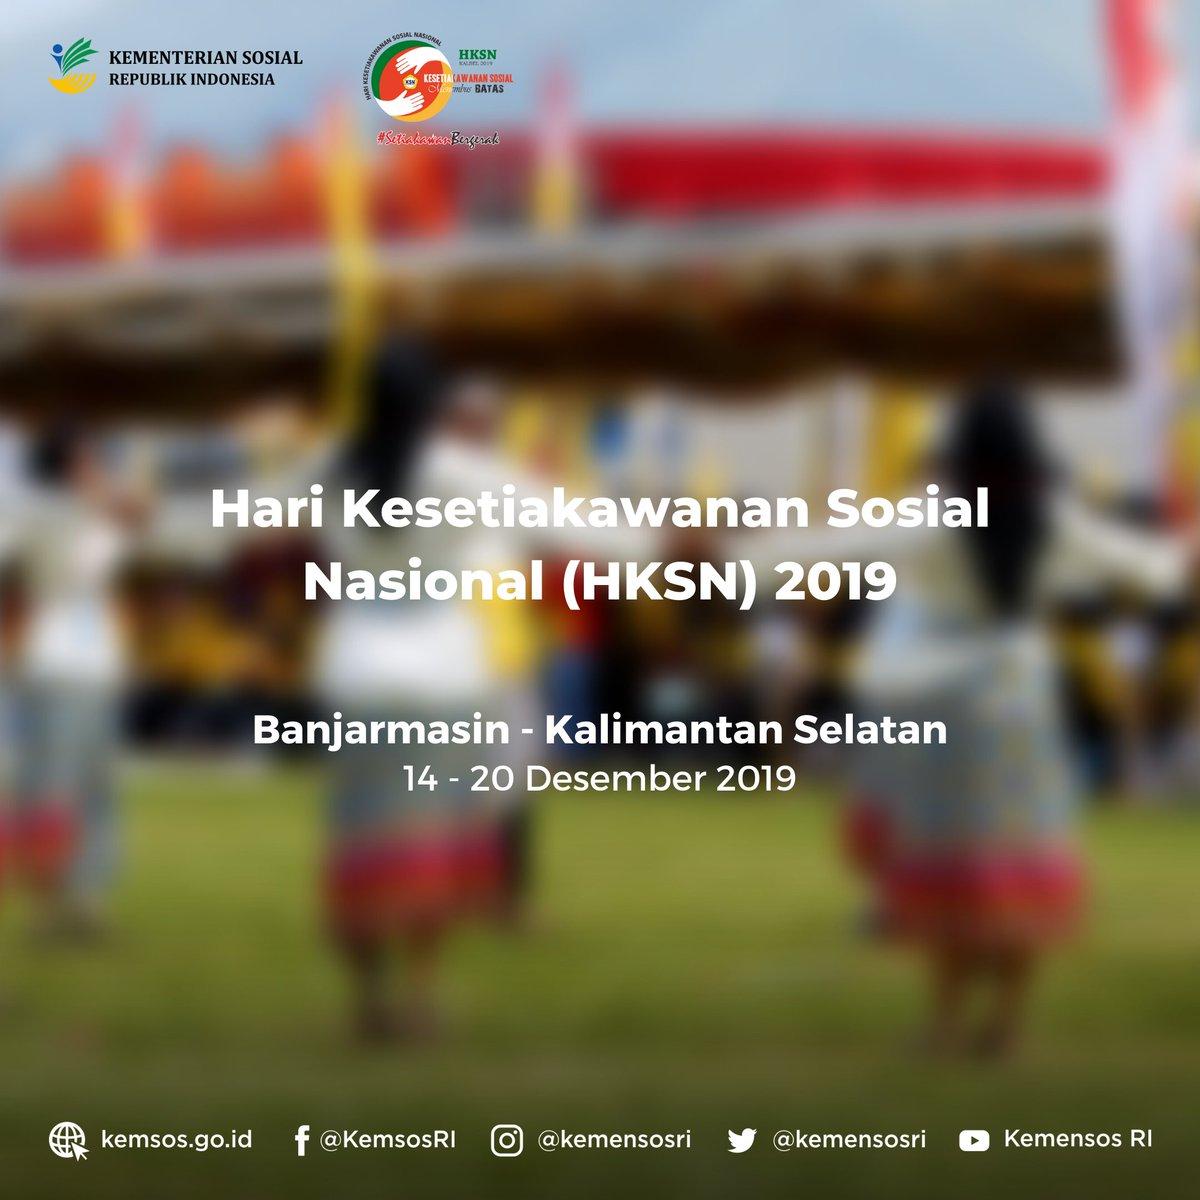 "Selamat malam #SobatSosial. Jelang Hari Kesetiakawanan Sosial Nasional (HKSN) 2019 dengan tema ""Menembus Batas"", Minsos akan berbagi konten-konten menarik seputar isu kesetiakawanan #SetiakawanBergerak #Kemensos #IndonesiaMaju"